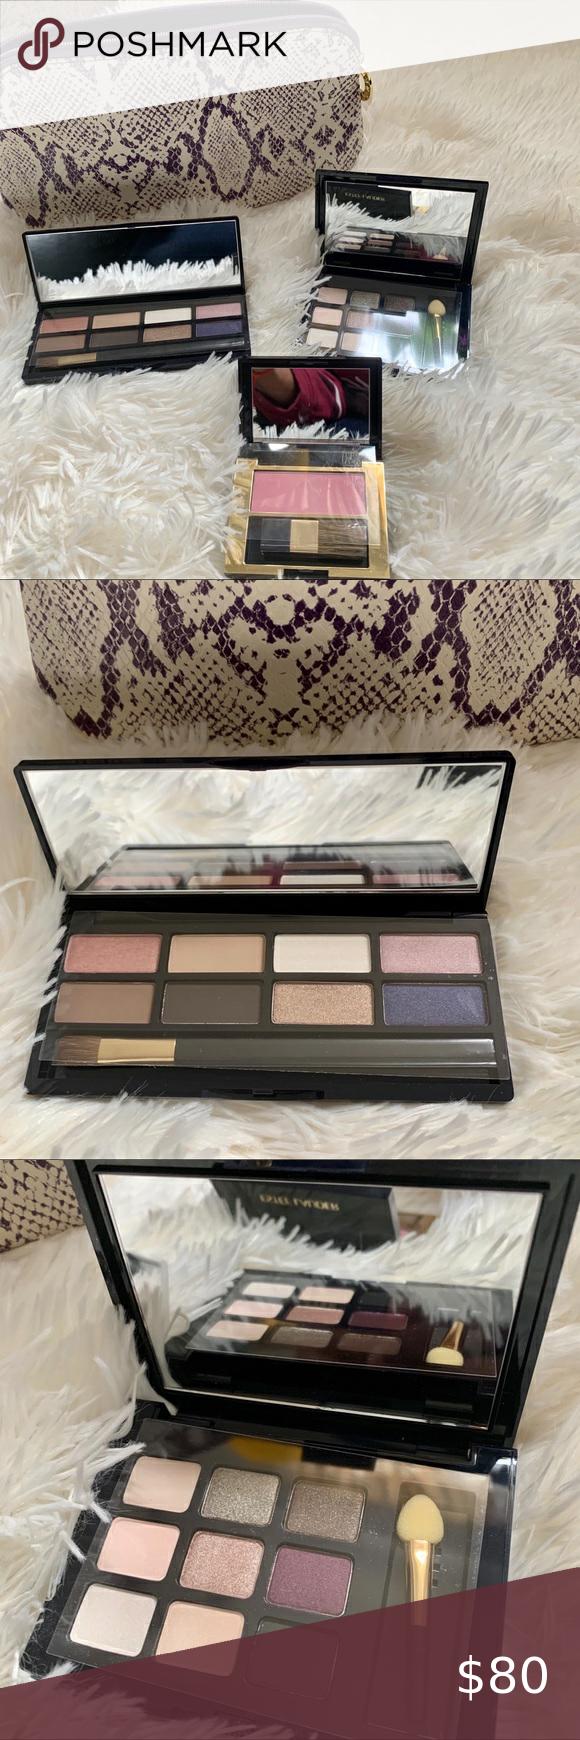 Estee Lauder Pure Color makeup gift set NWT en 2020